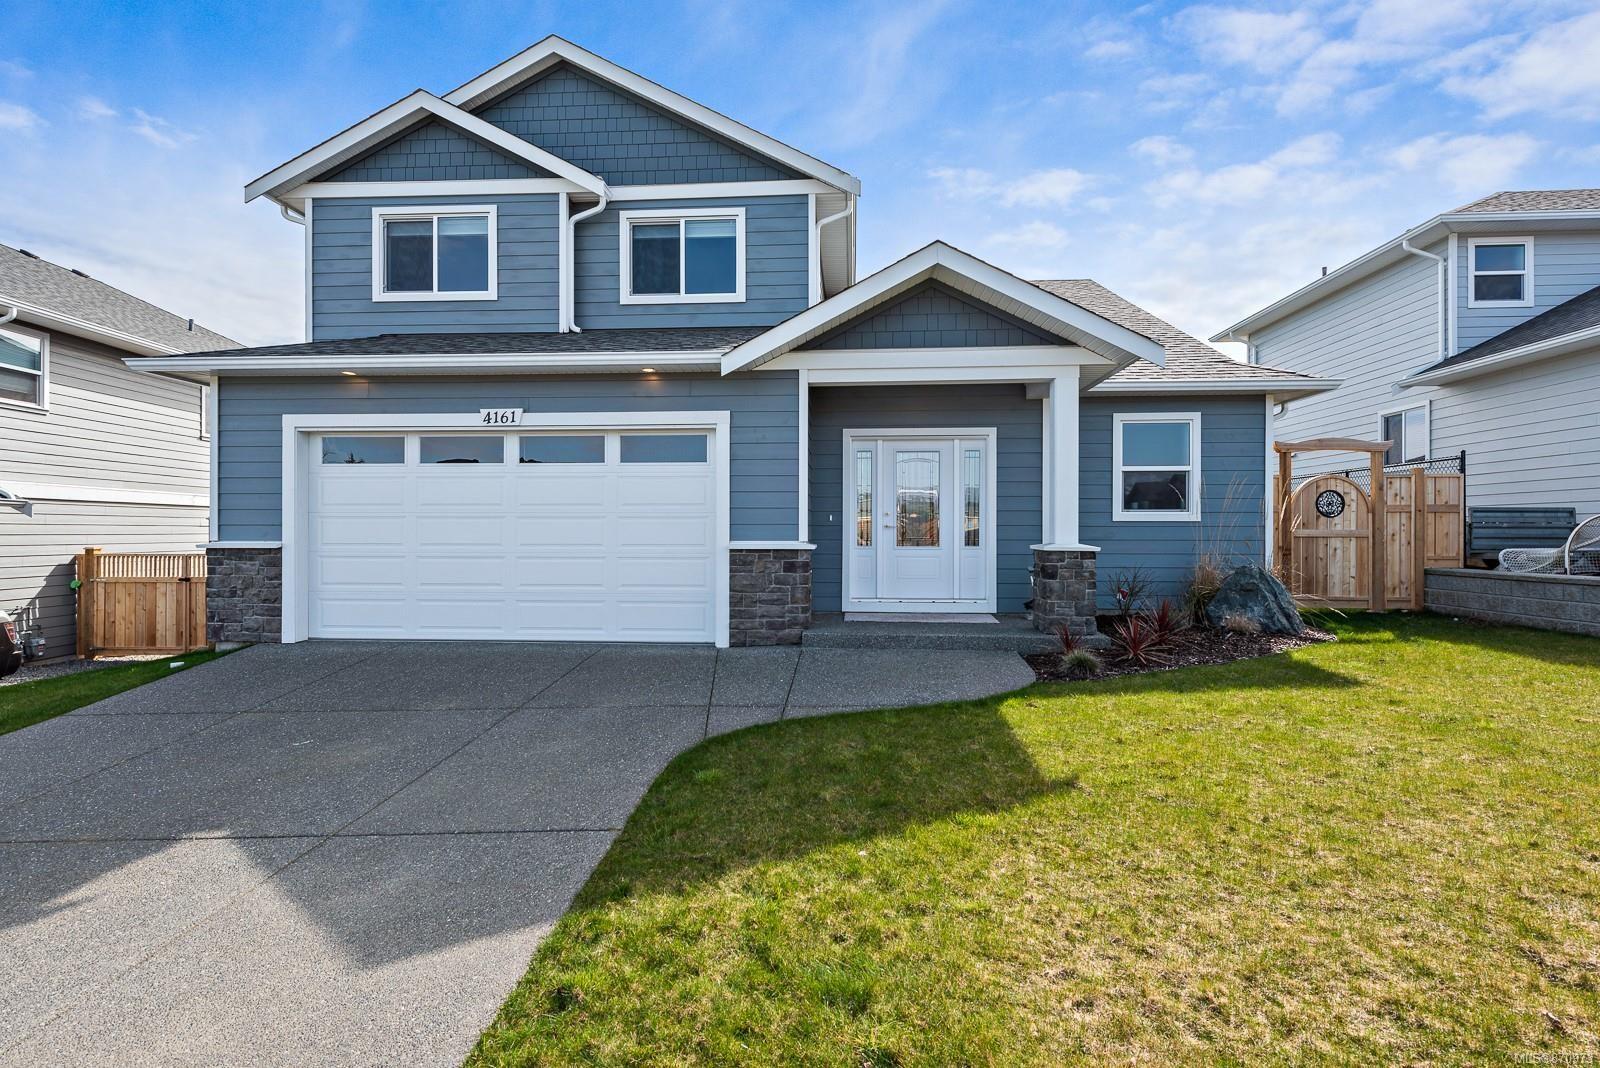 Main Photo: 4161 Chancellor Cres in : CV Courtenay City House for sale (Comox Valley)  : MLS®# 870973